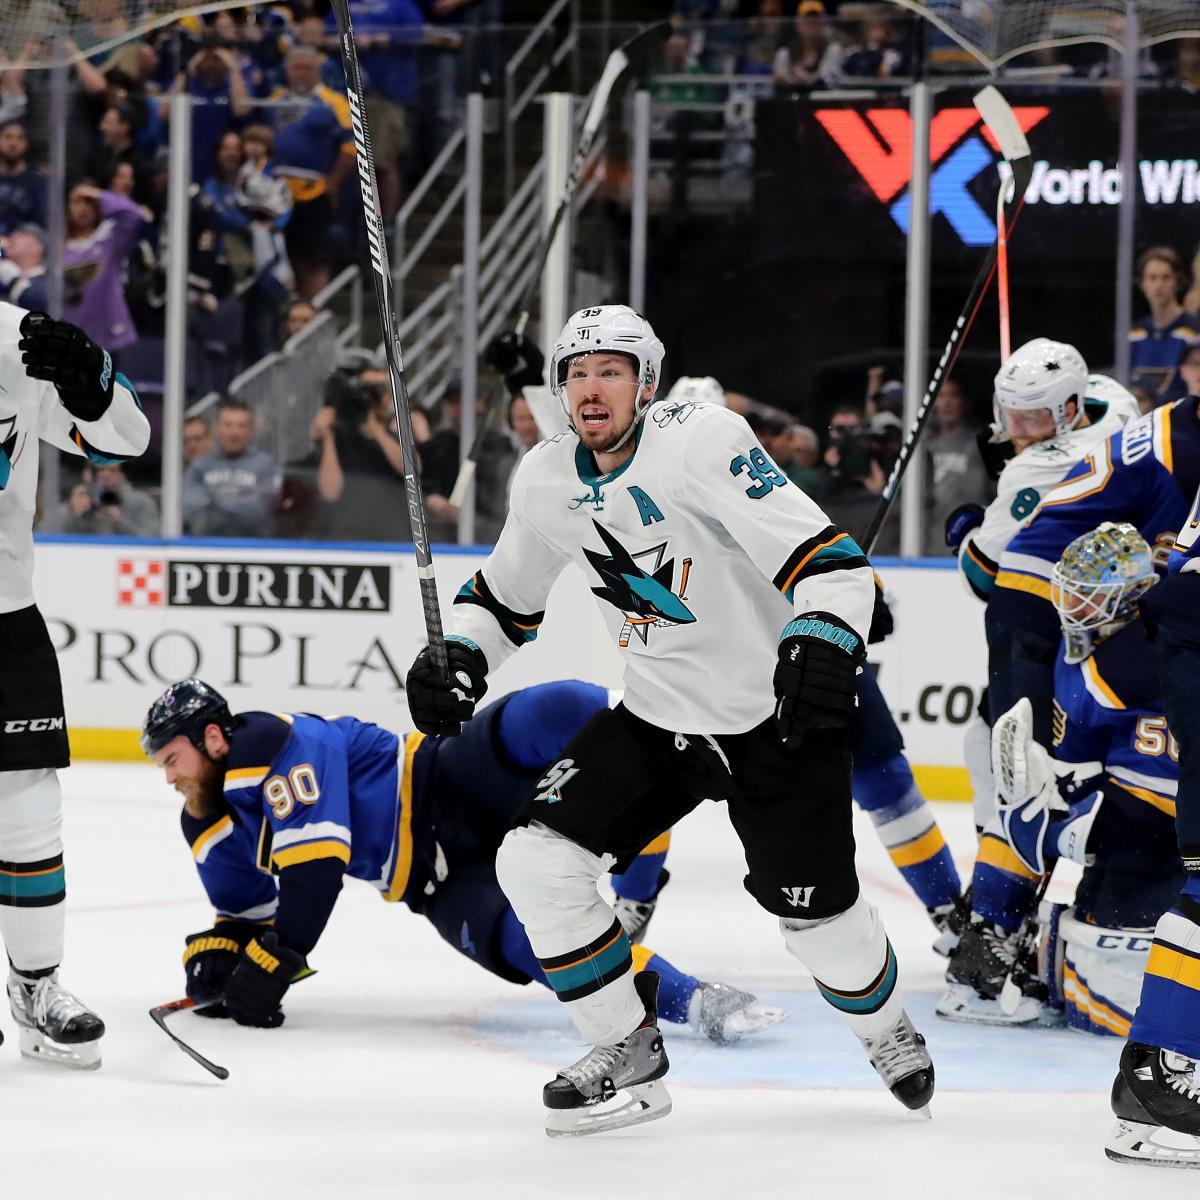 Erik Karlsson OT Winner Powers Sharks to Game 3 Win, 2-1 Series Lead vs. Blues